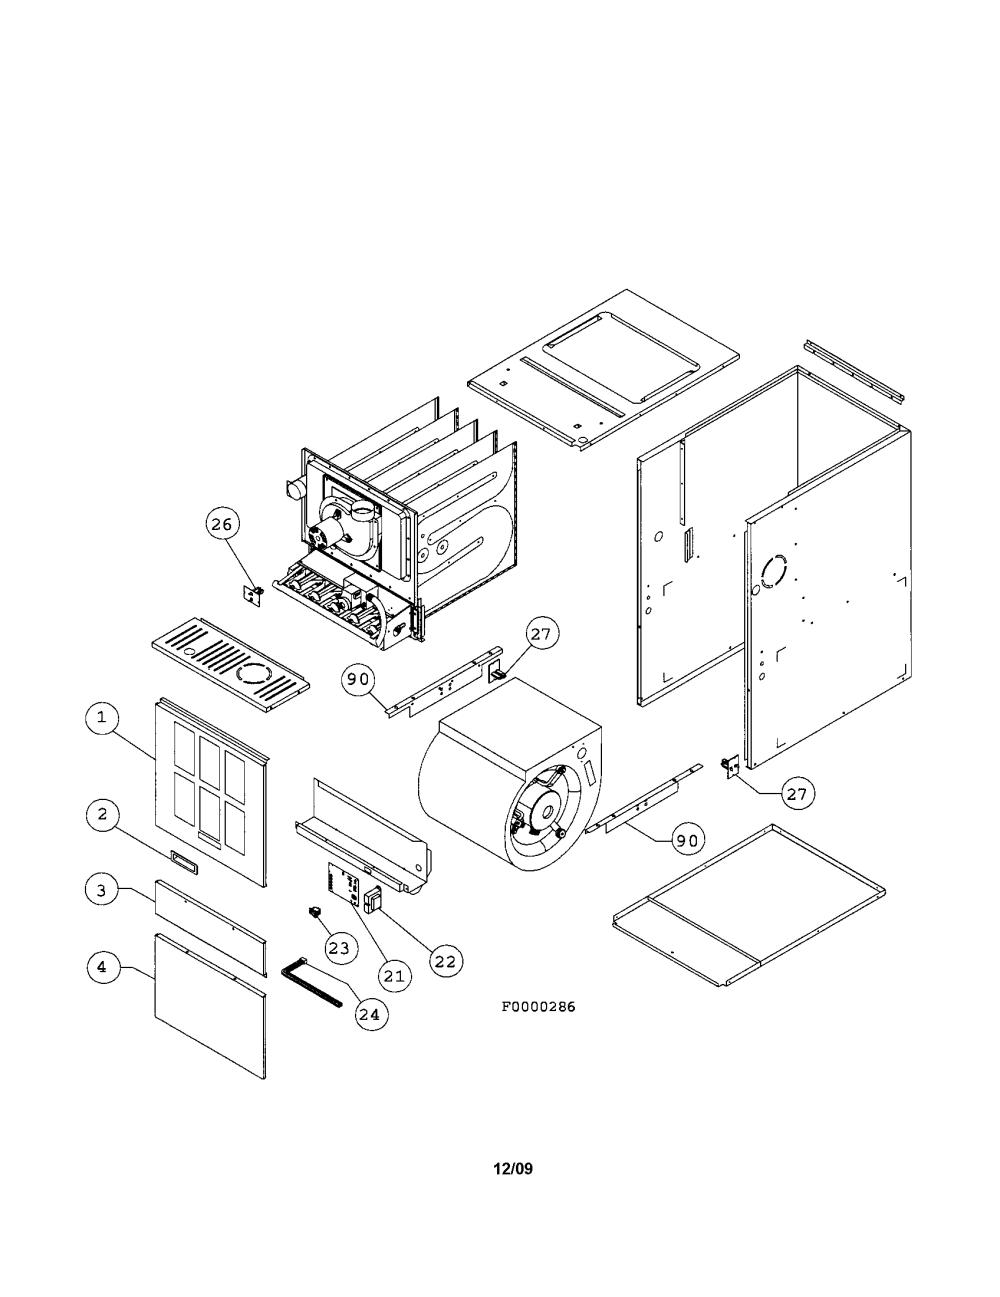 medium resolution of images of ducane furnace parts